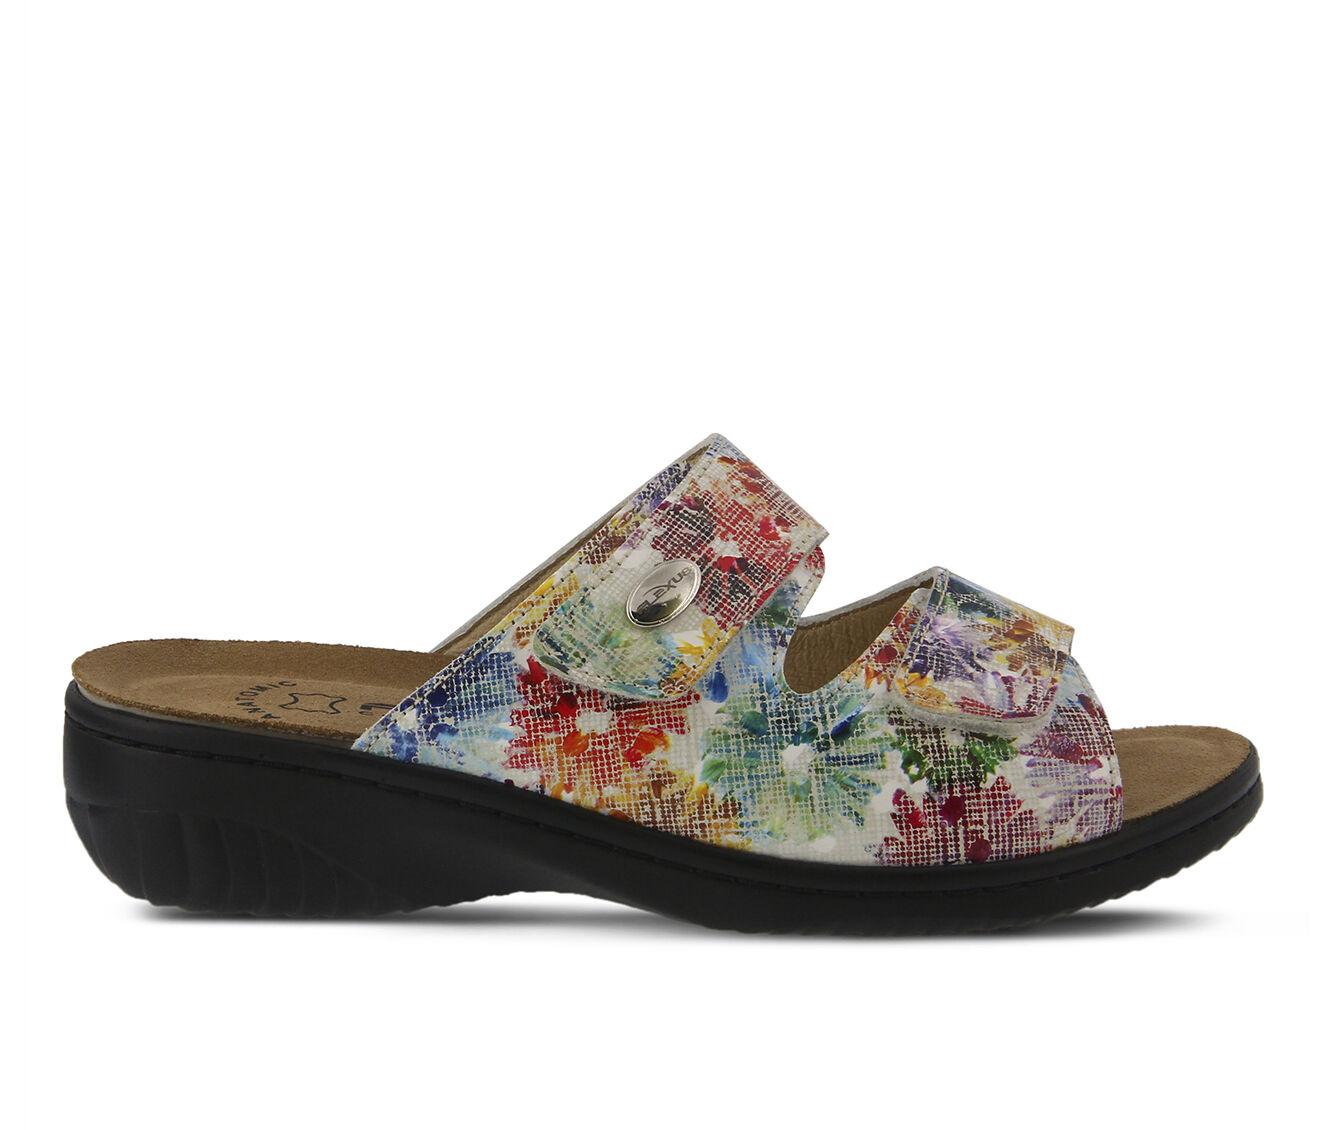 Women's FLEXUS Bellasa Sandals White Multi